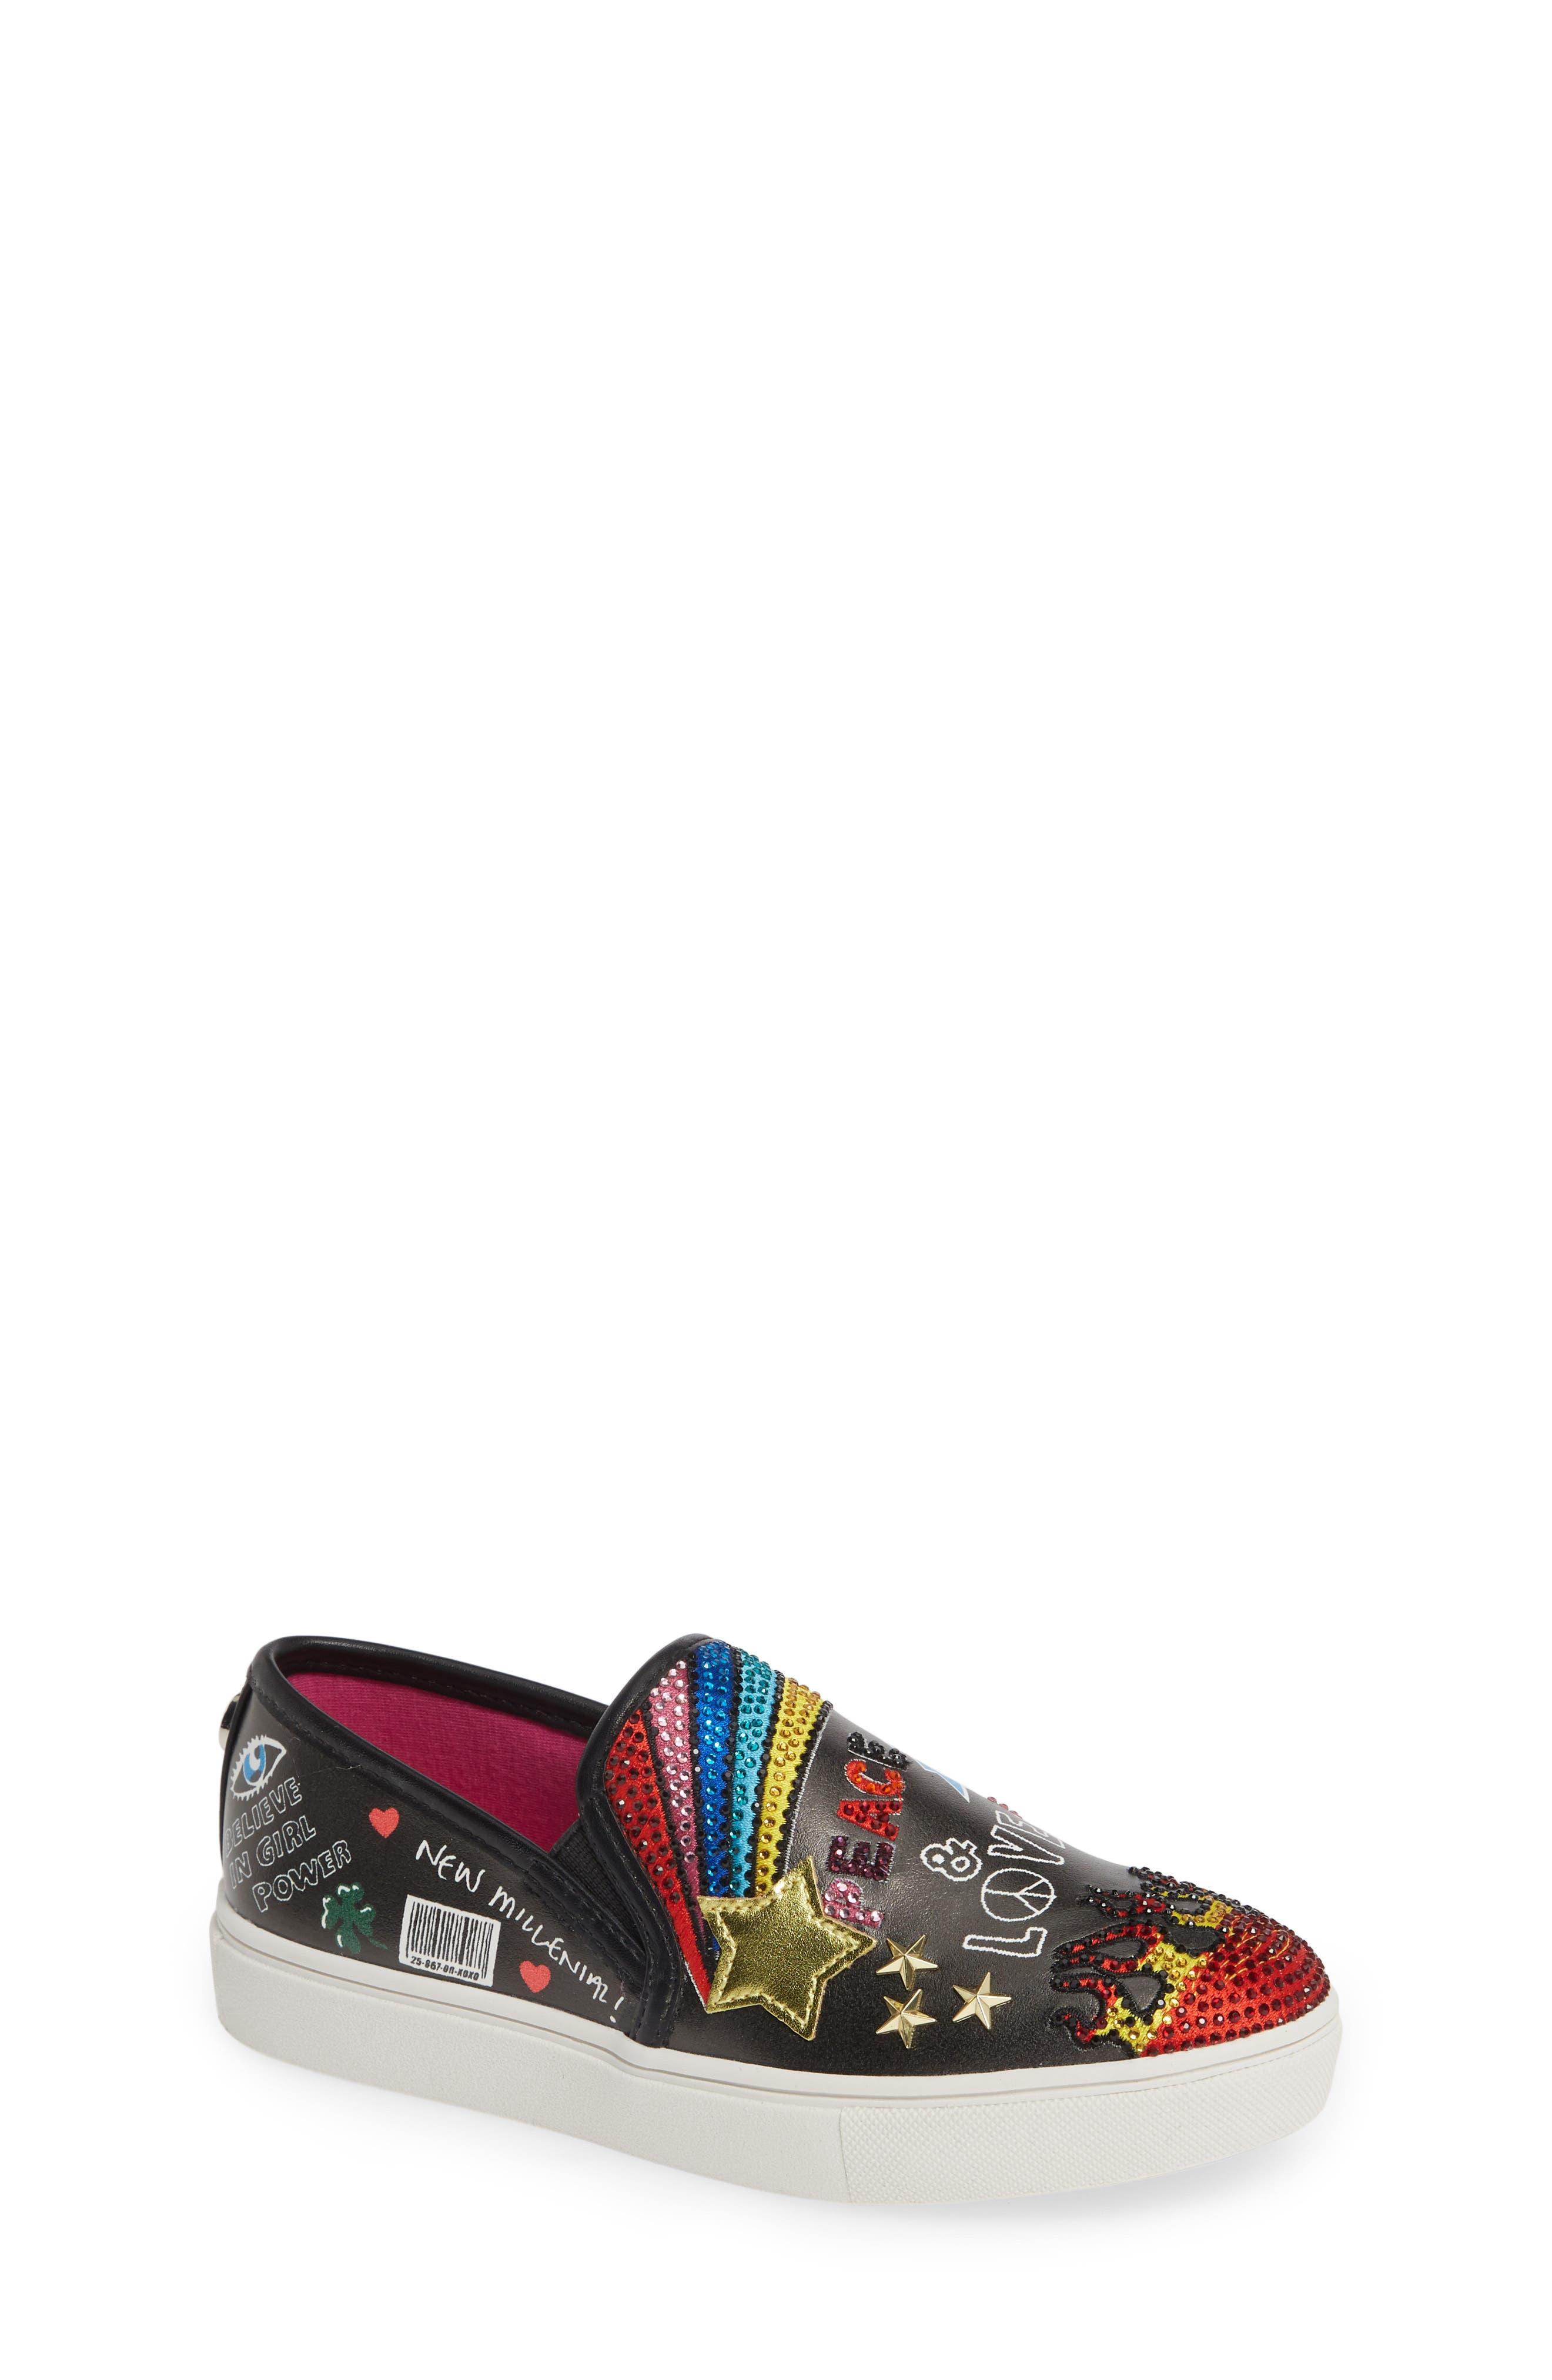 STEVE MADDEN JPOWRFUL Embellished Slip-On Sneaker, Main, color, BLACK MULTI